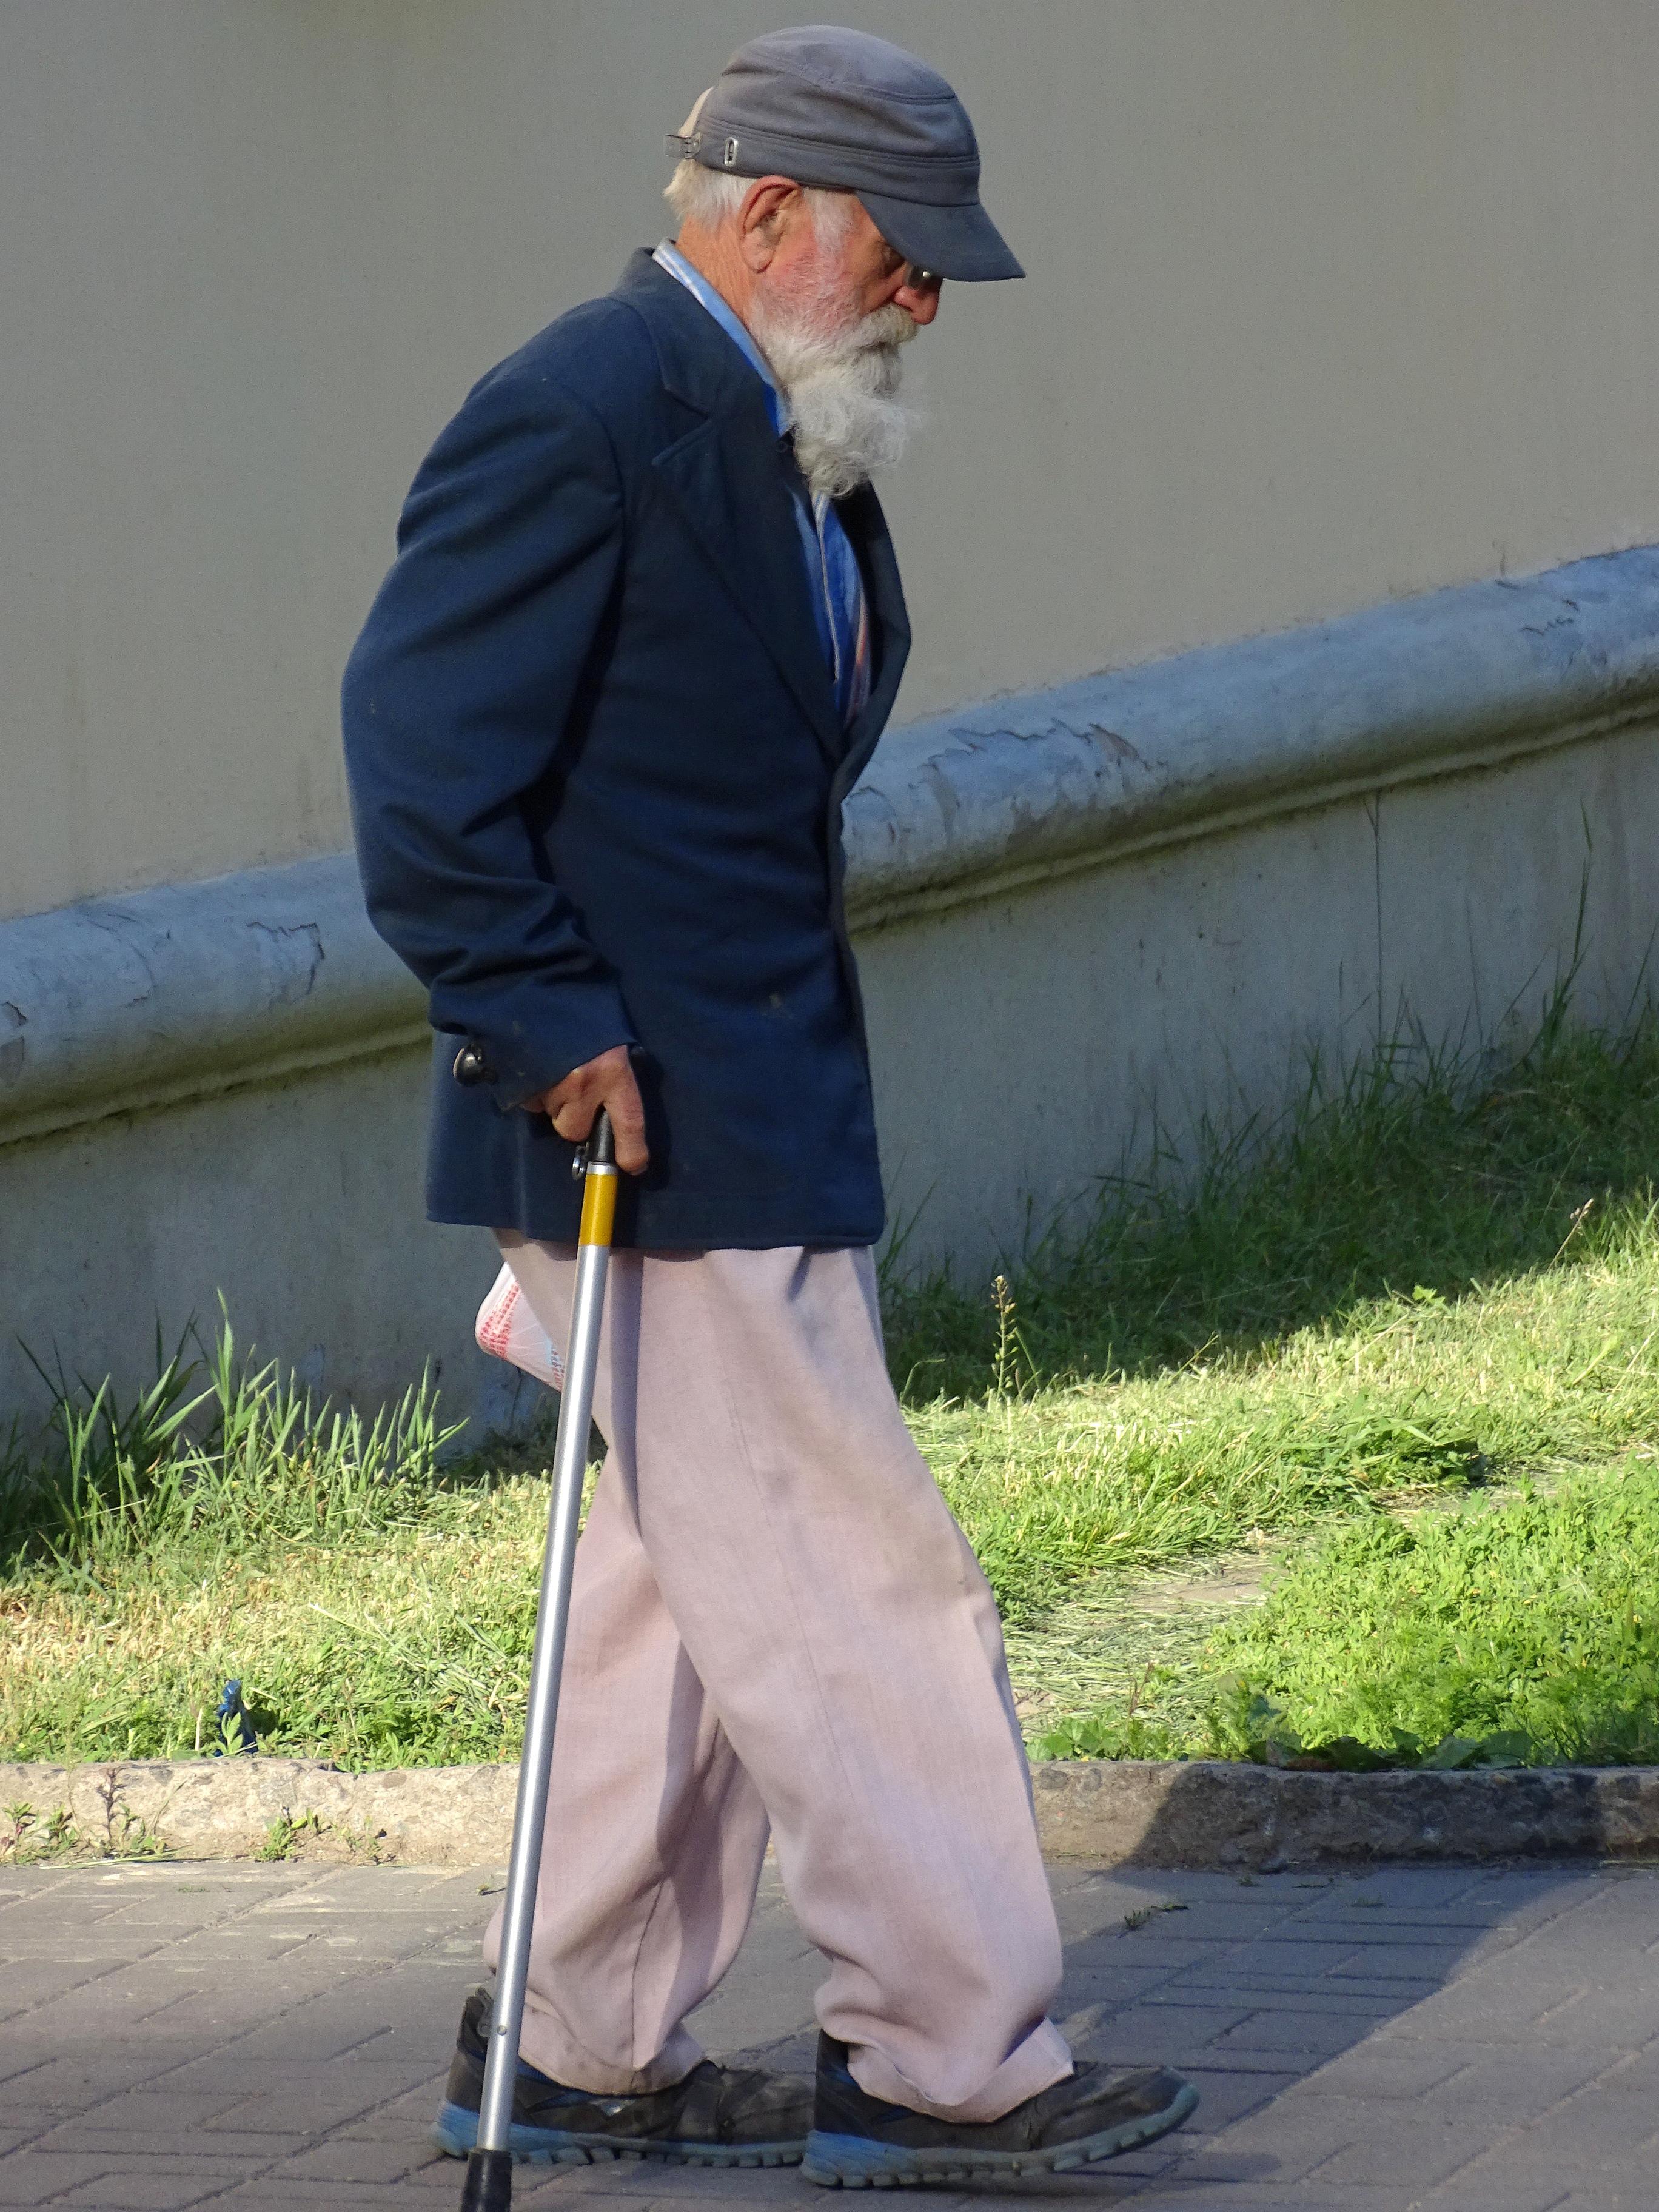 Image result for balance classes for elderly